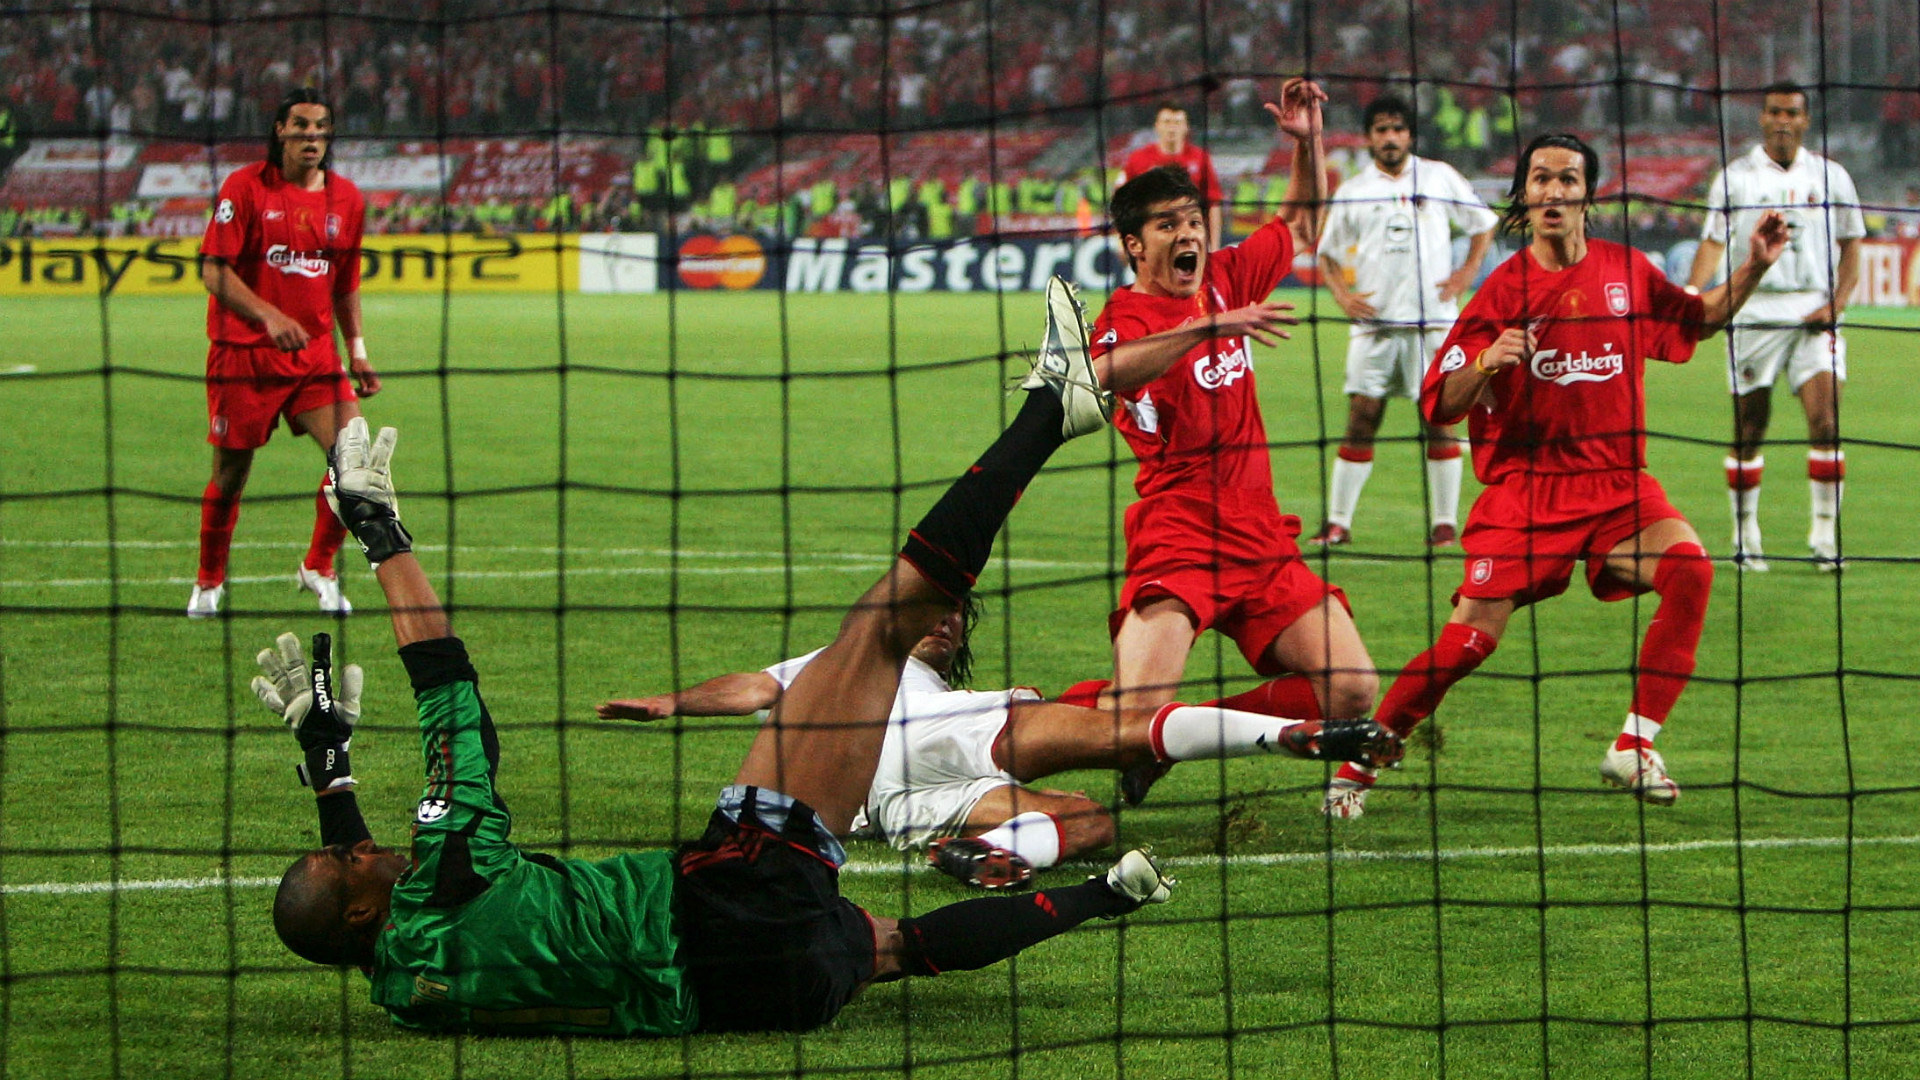 Liverpool Champions League 2004-05